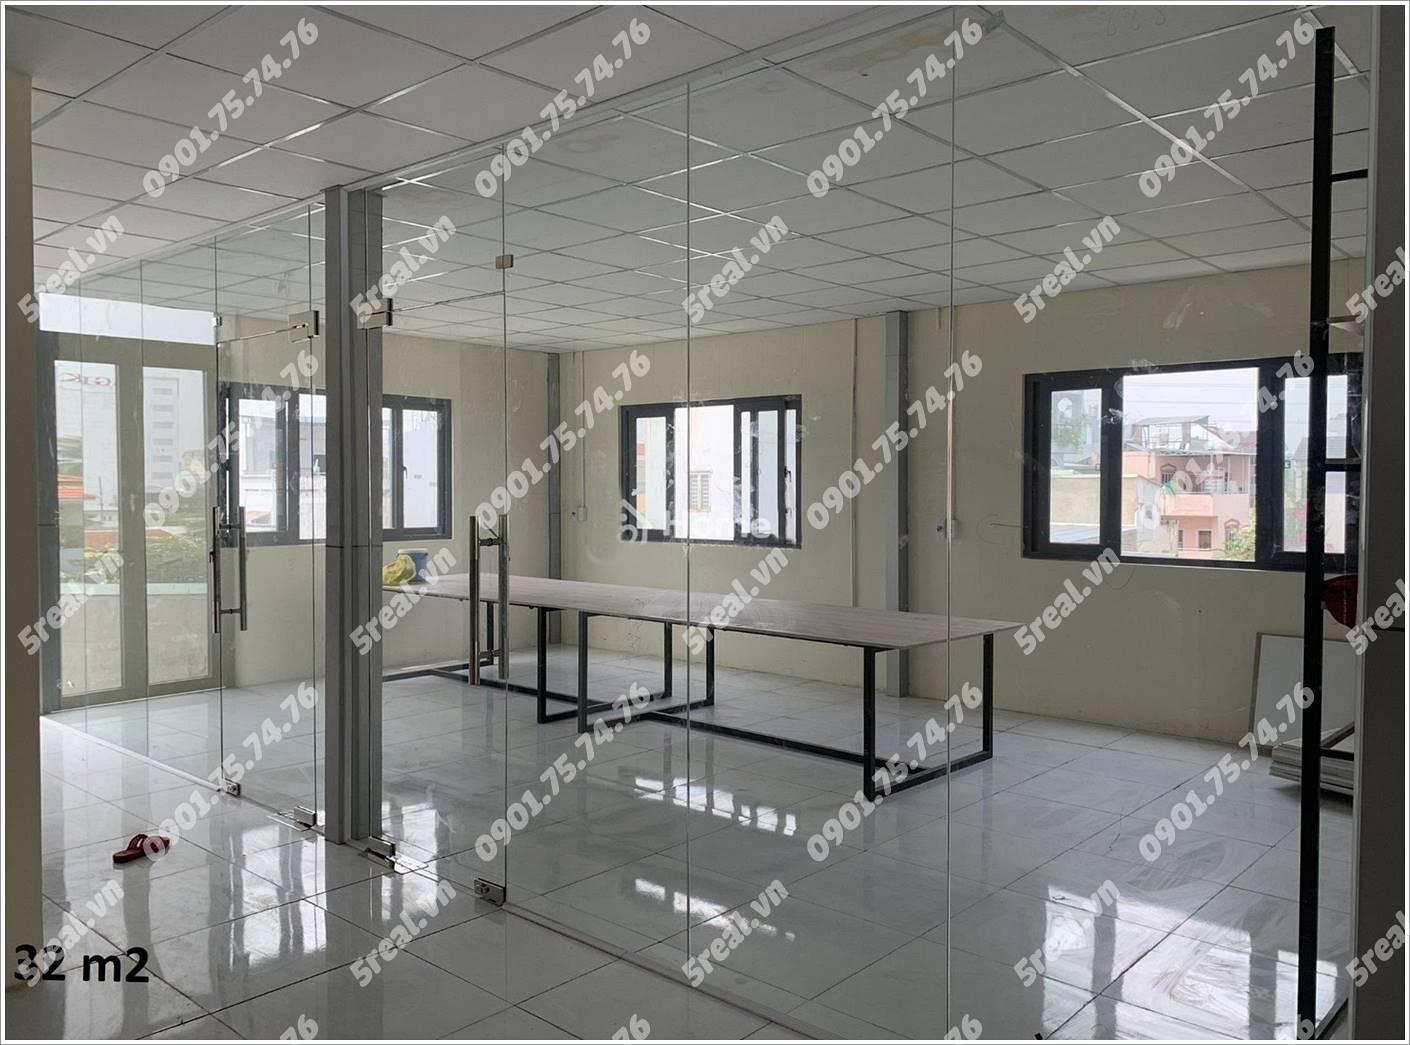 vuong-an-building-duong-so-7-quan-thu-duc-van-phong-cho-thue-tphcm-5real.vn-04